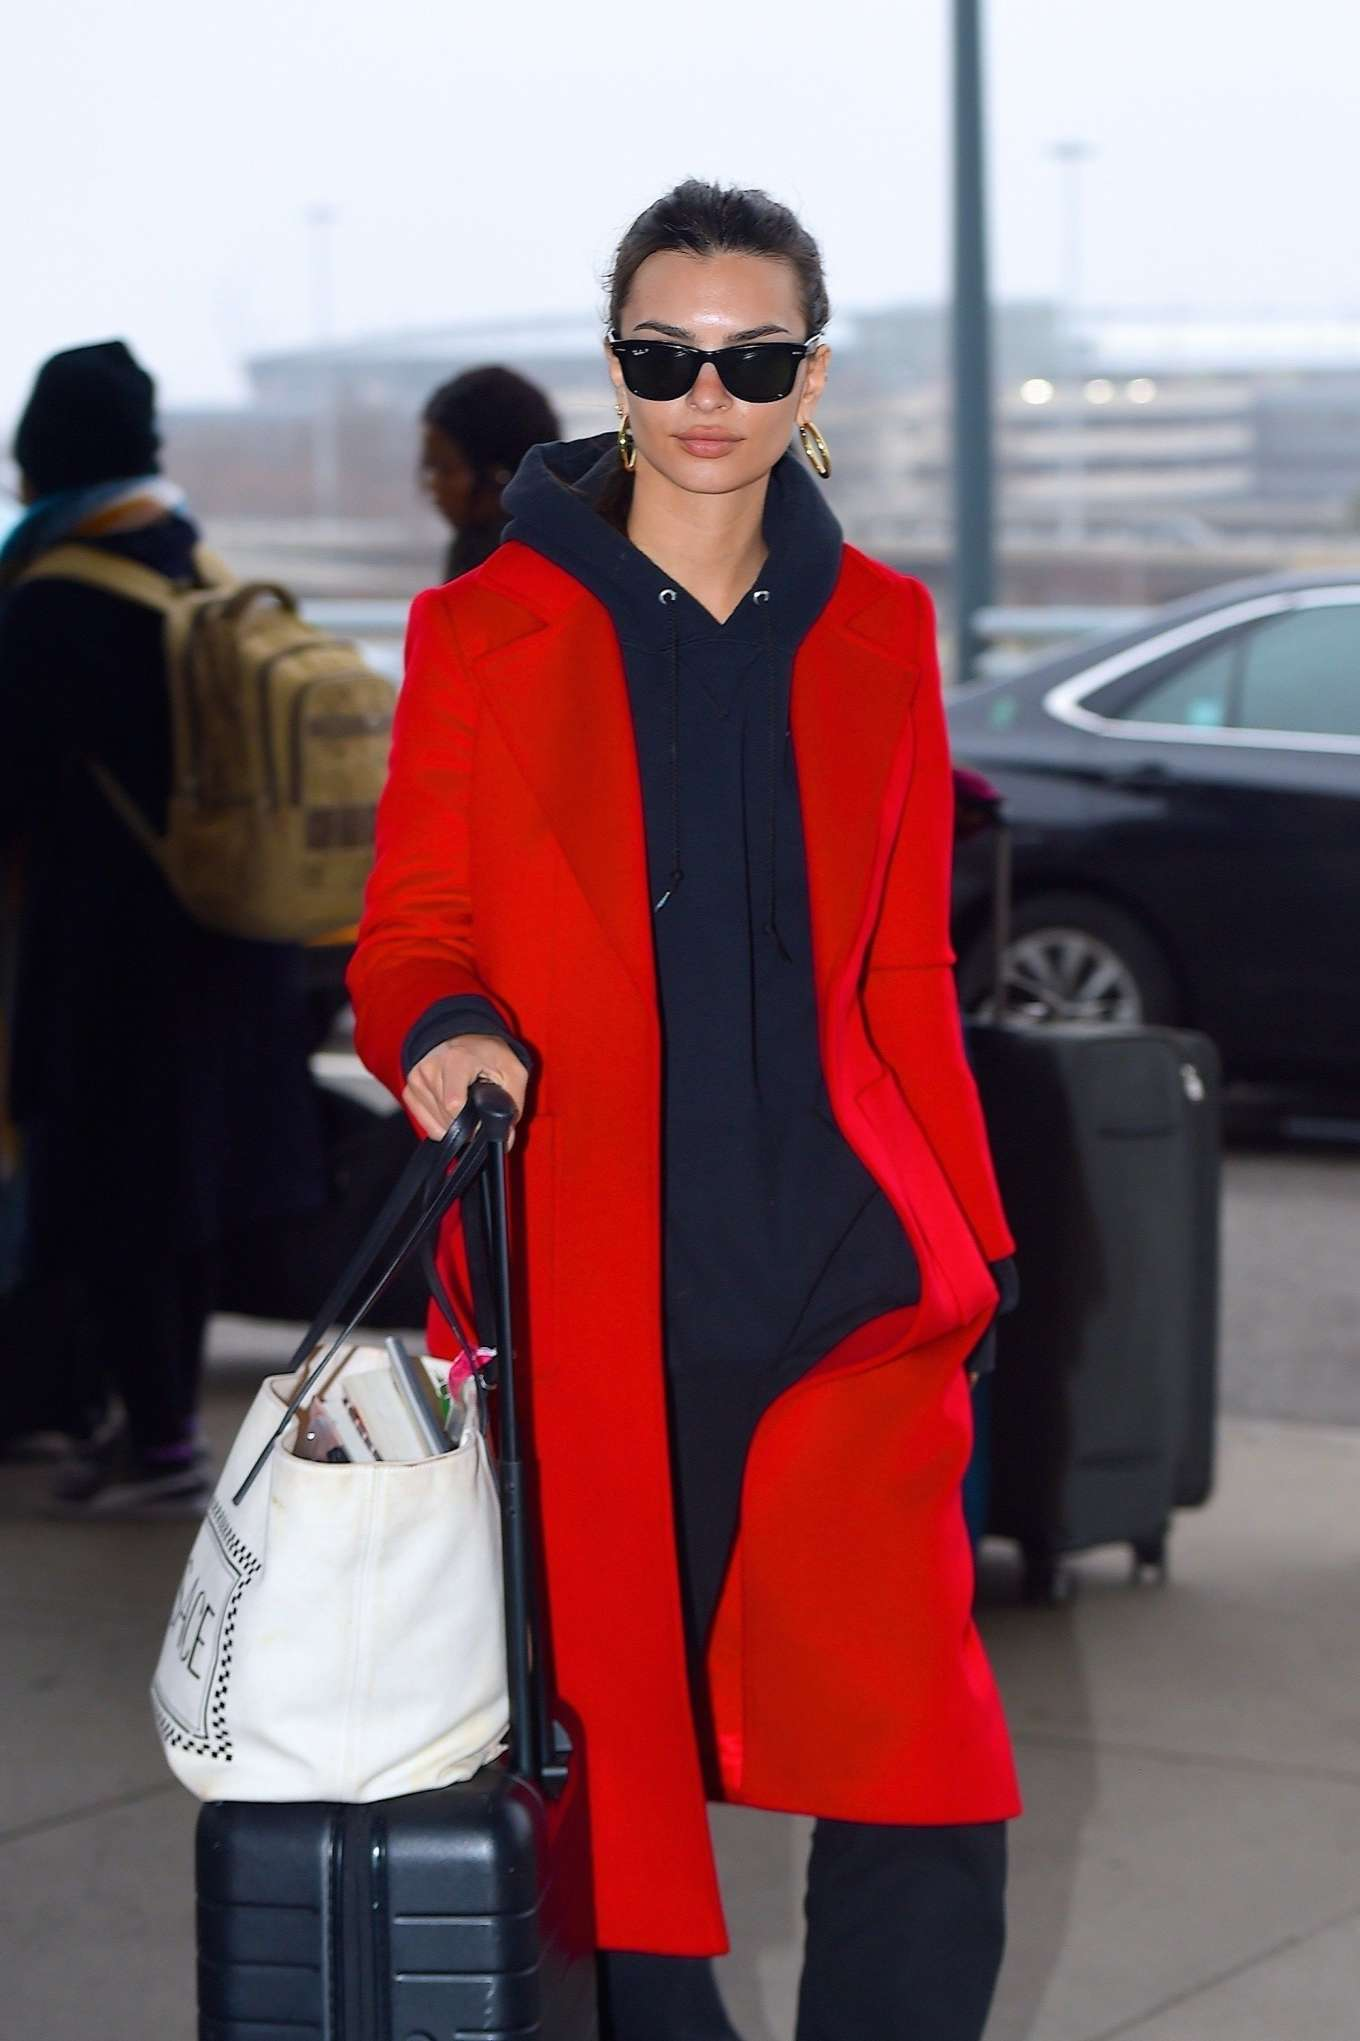 Emily Ratajkowski 2020 : Emily Ratajkowski in red coat ready for flight at JFK airport-08